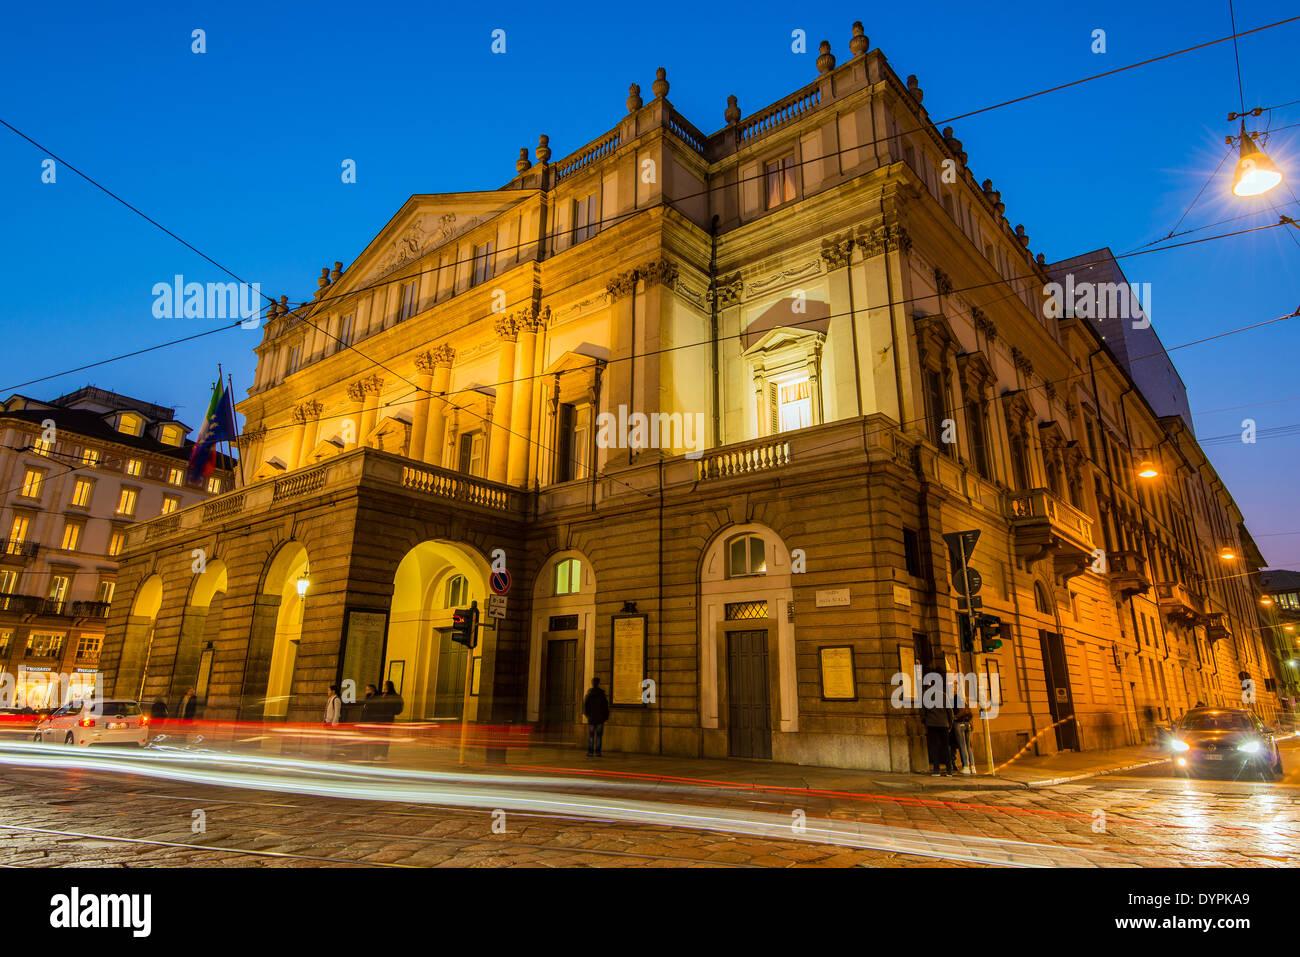 La Scala opera theatre by night, Milan, Lombardy, Italy - Stock Image